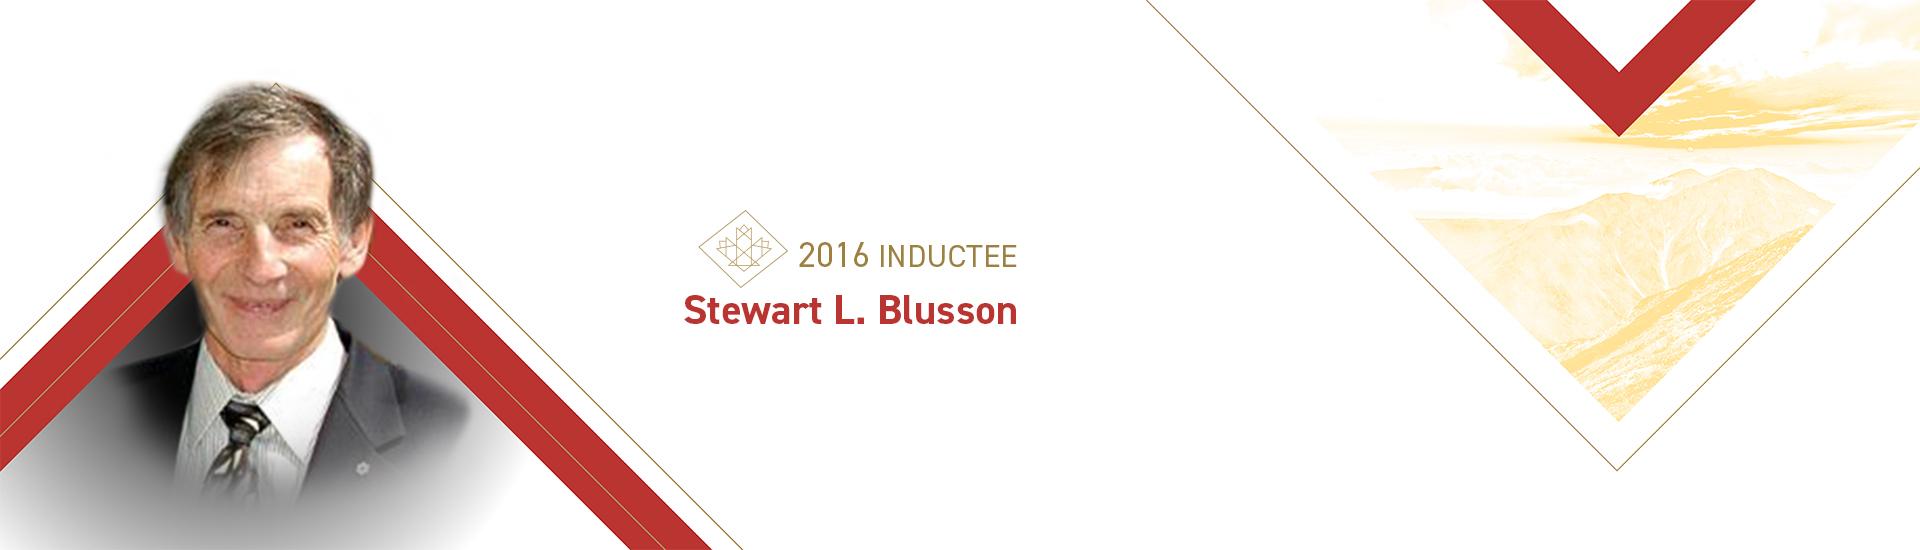 Stewart L. Blusson (b. 1938)